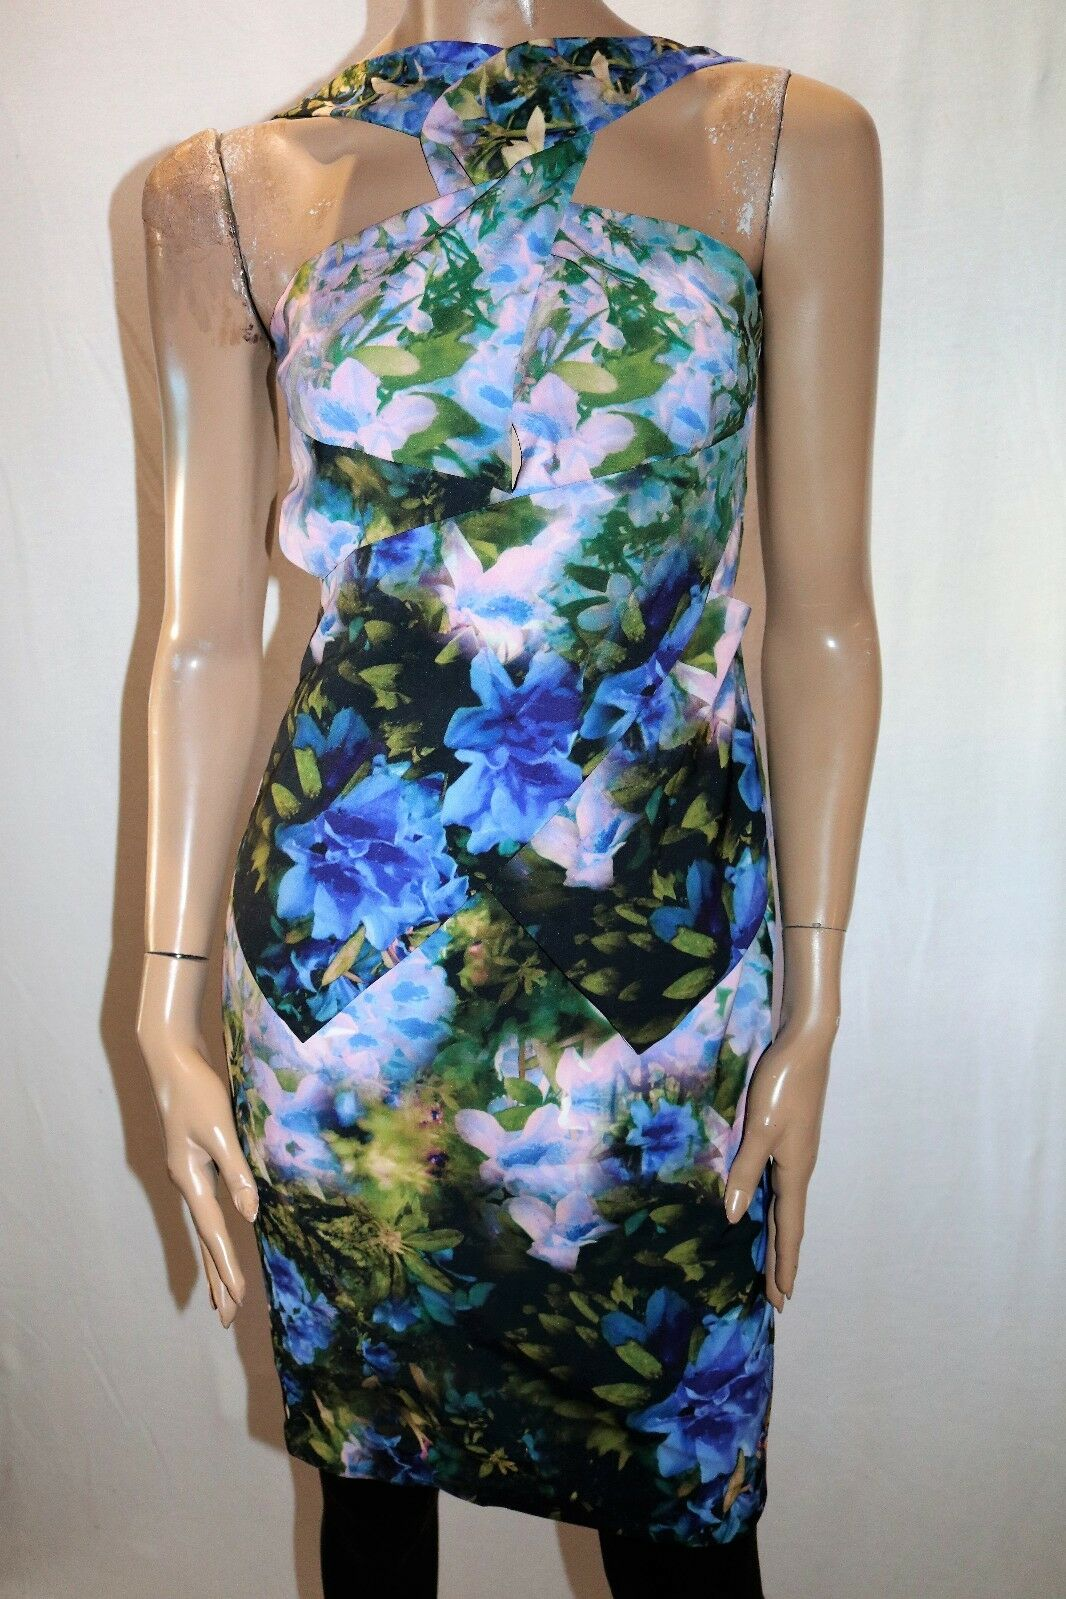 Ministry of Style Brand Multi Colour Floret Peplum Dress Größe 8 BNWT  TN13